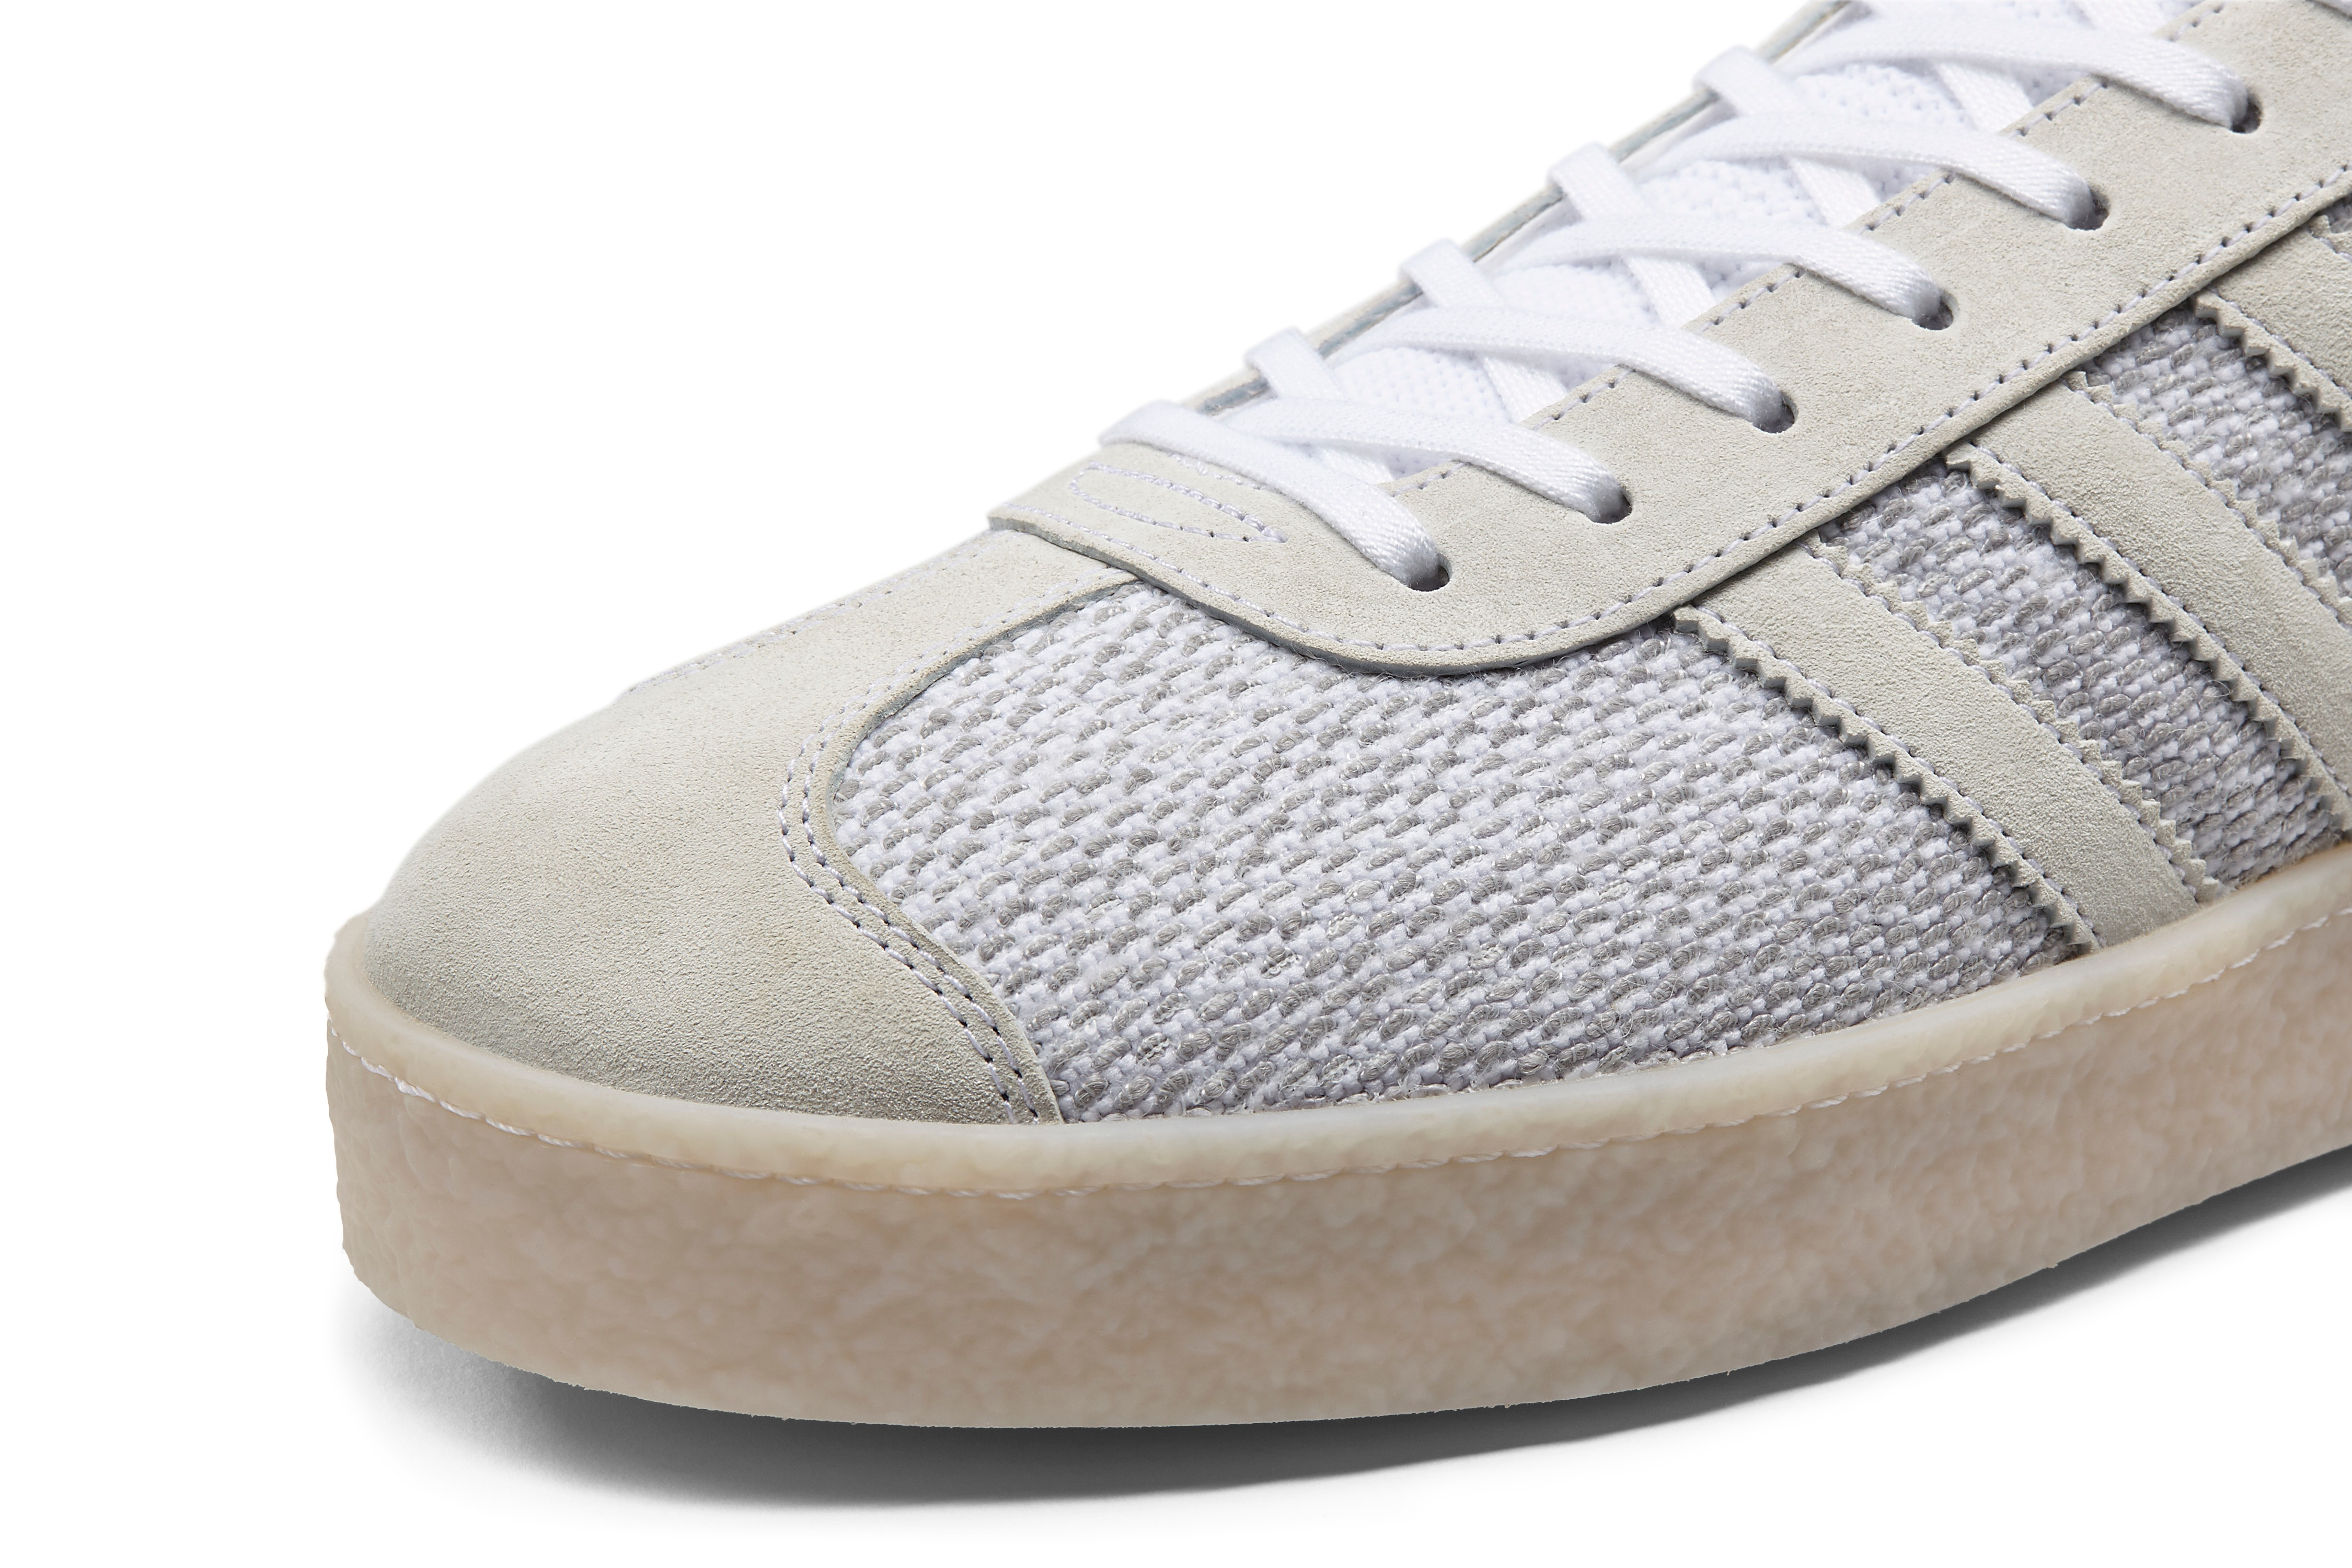 JUICE x adidas Consortium Gazelle 聯乘